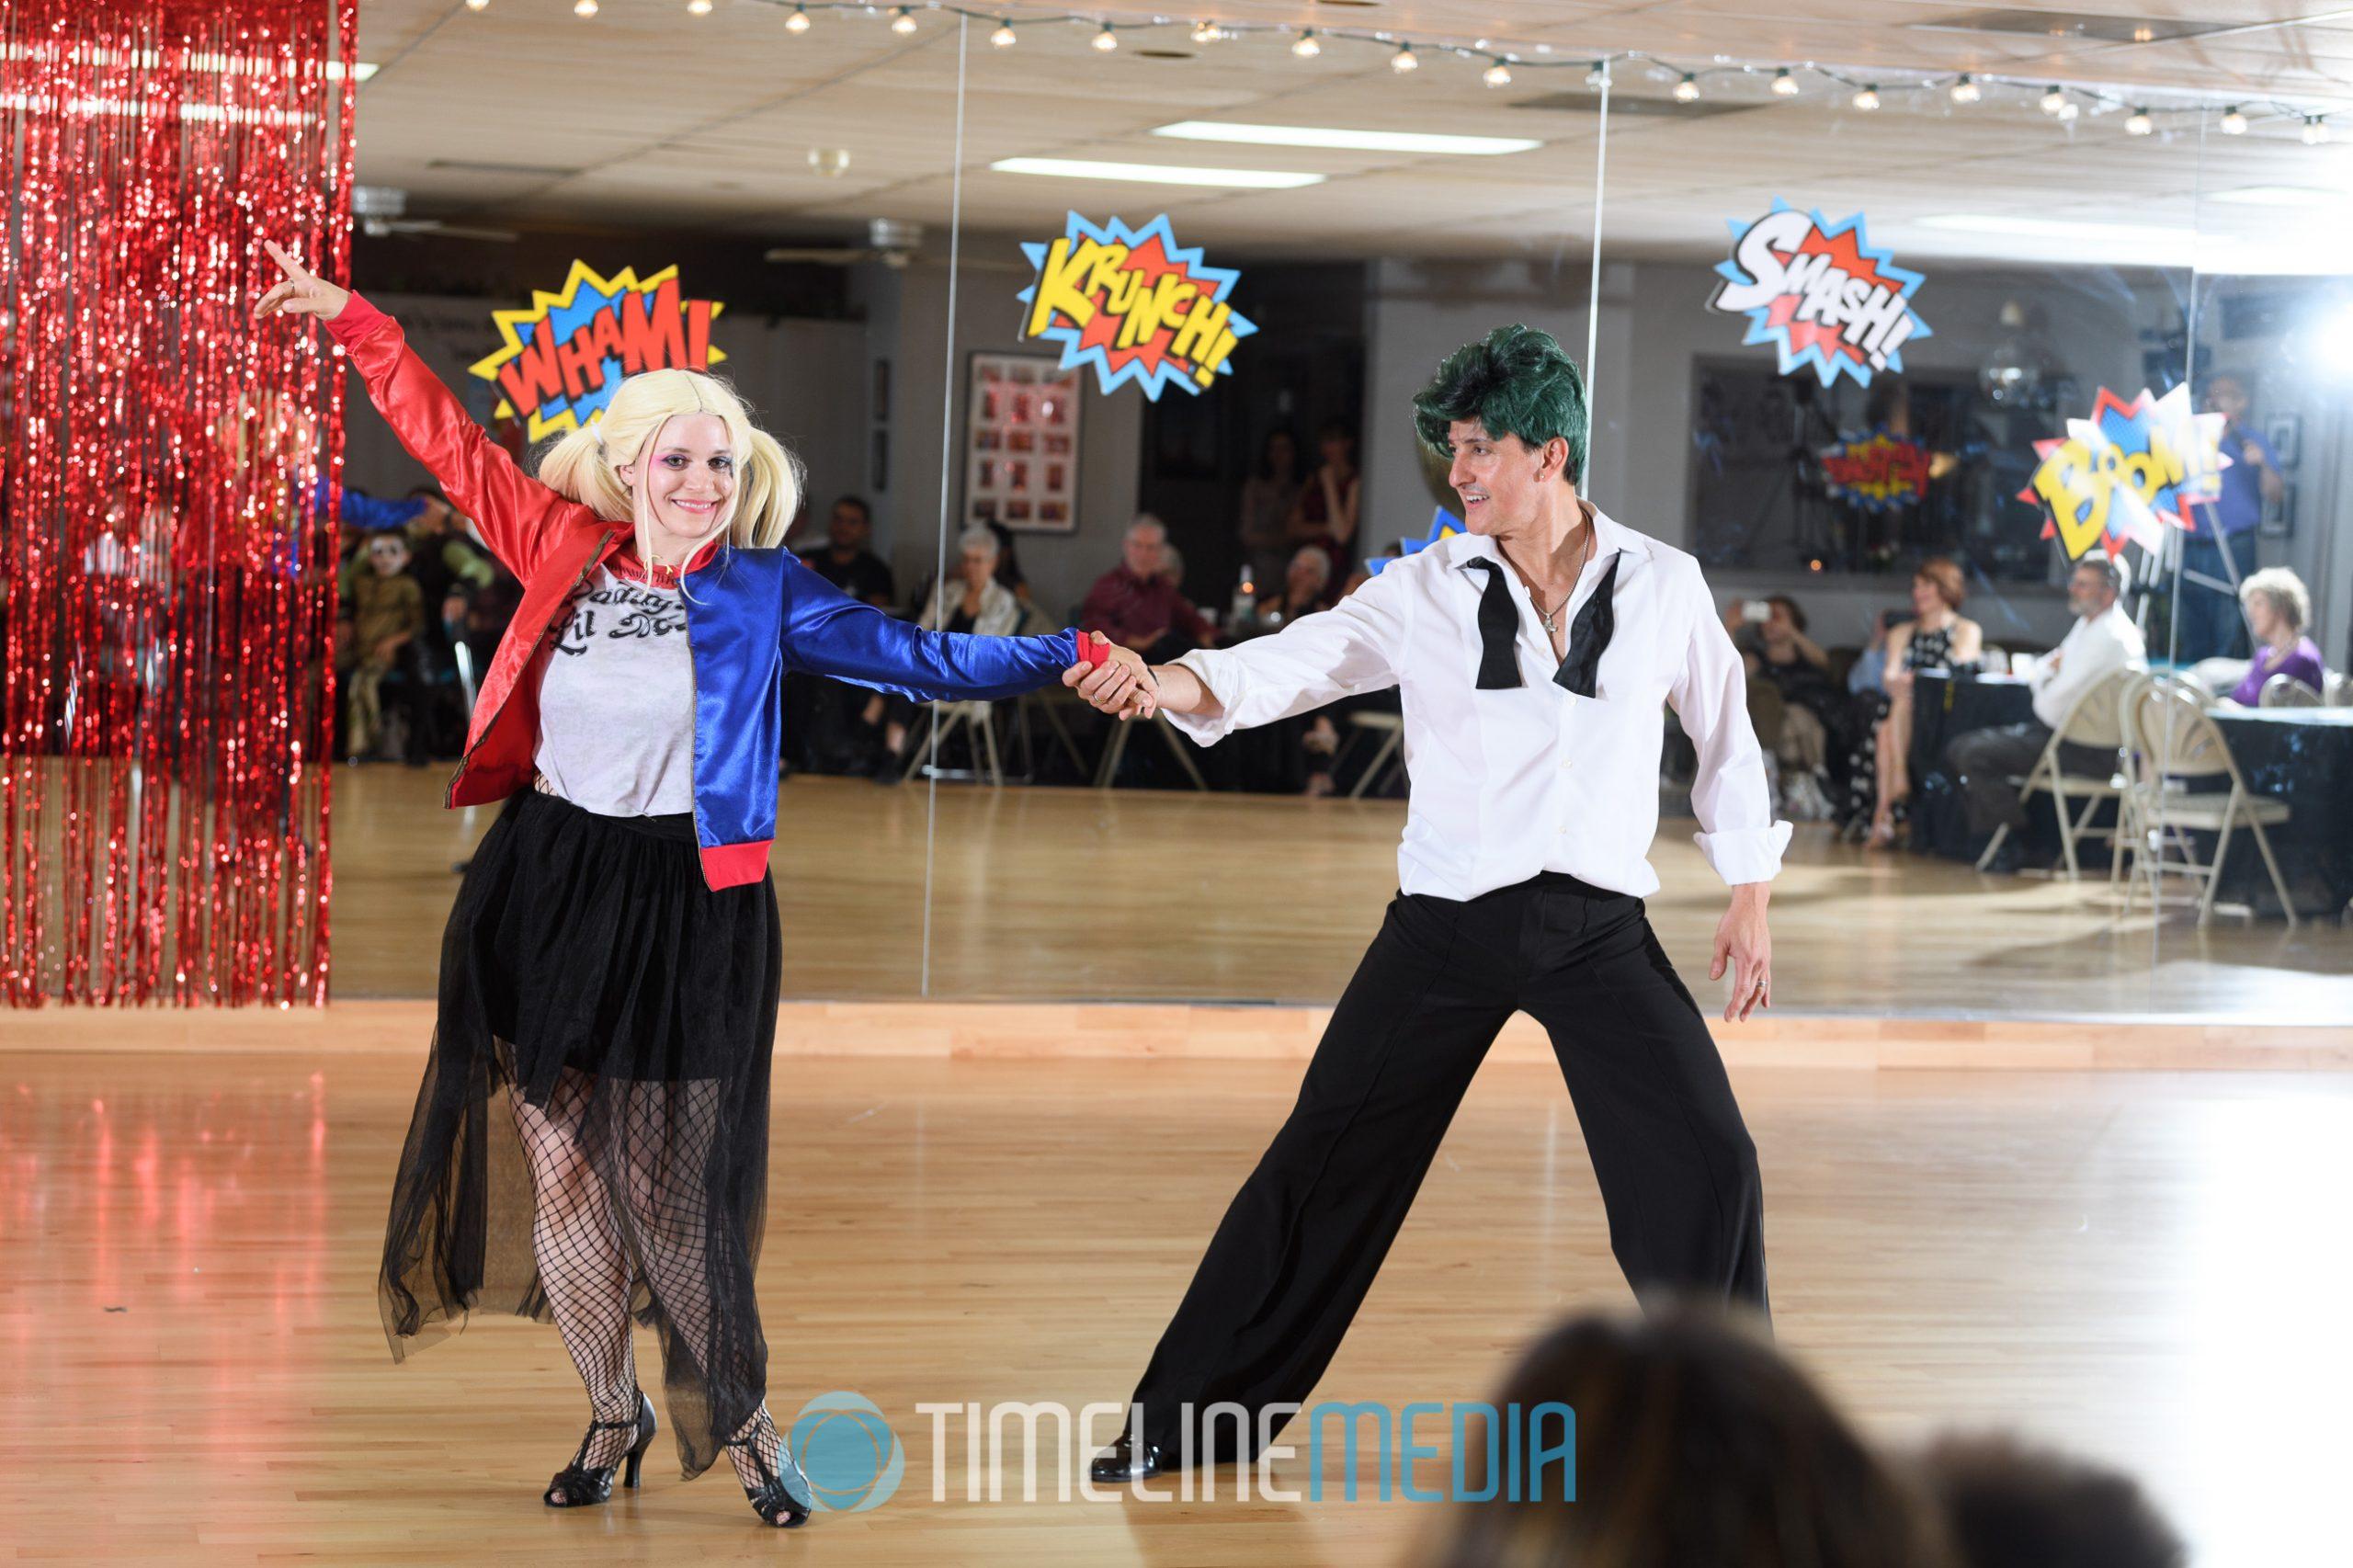 2018 That's Dancing Summer - Harley Quinn and Joker show ©TimeLine Media